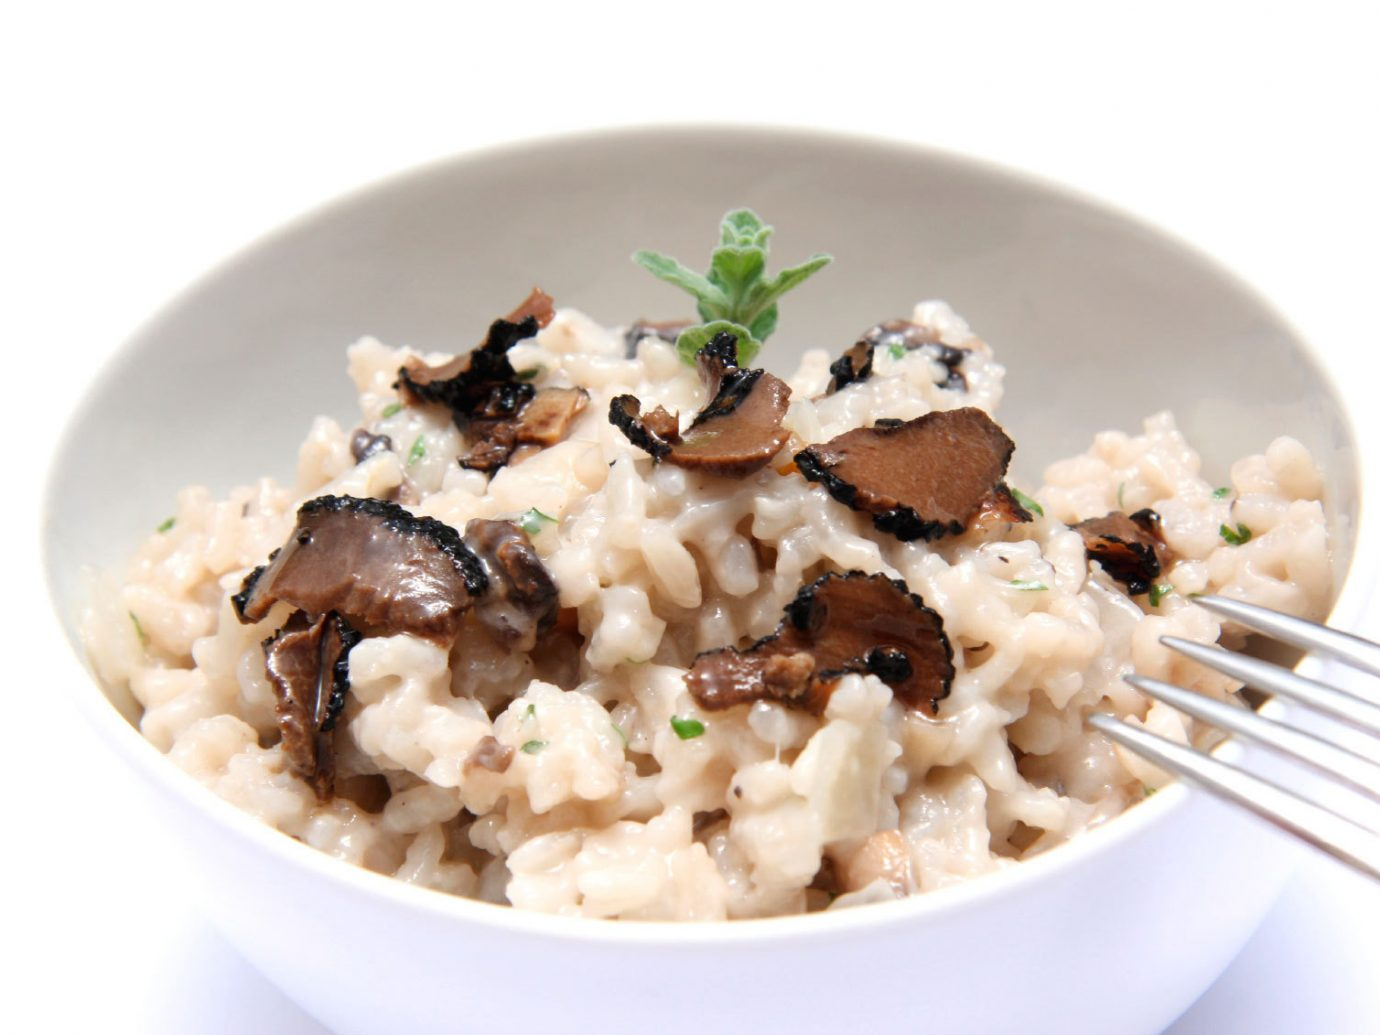 Food + Drink plate food dish white cuisine italian food risotto produce breakfast meal european food vegetarian food meat